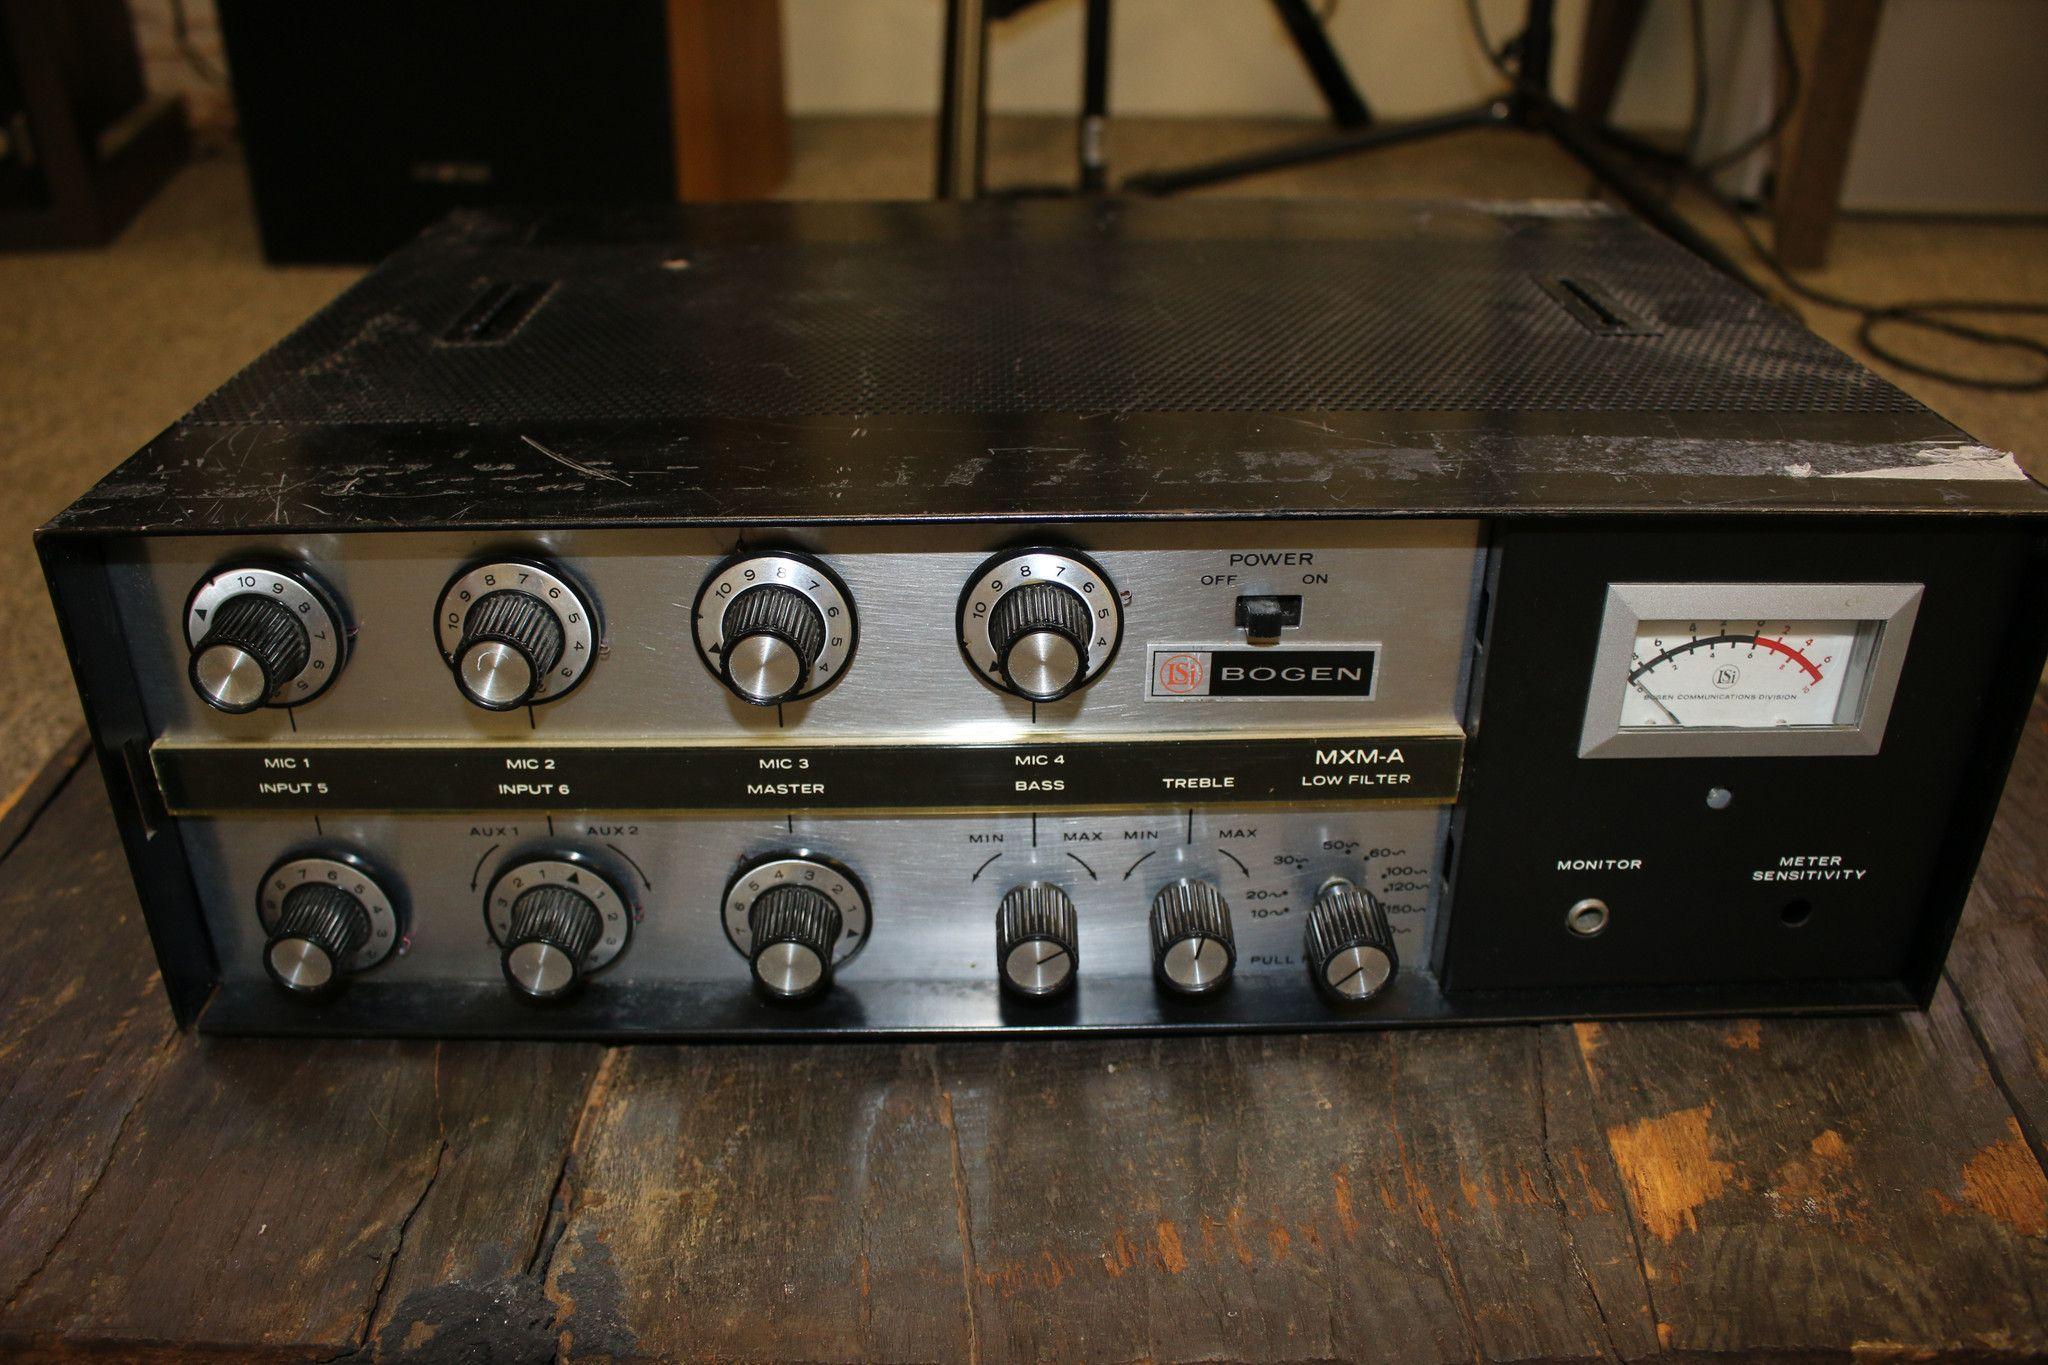 Bogen Mxm A Black Microphone Mixer Preamplifier Tube Audio Band 2